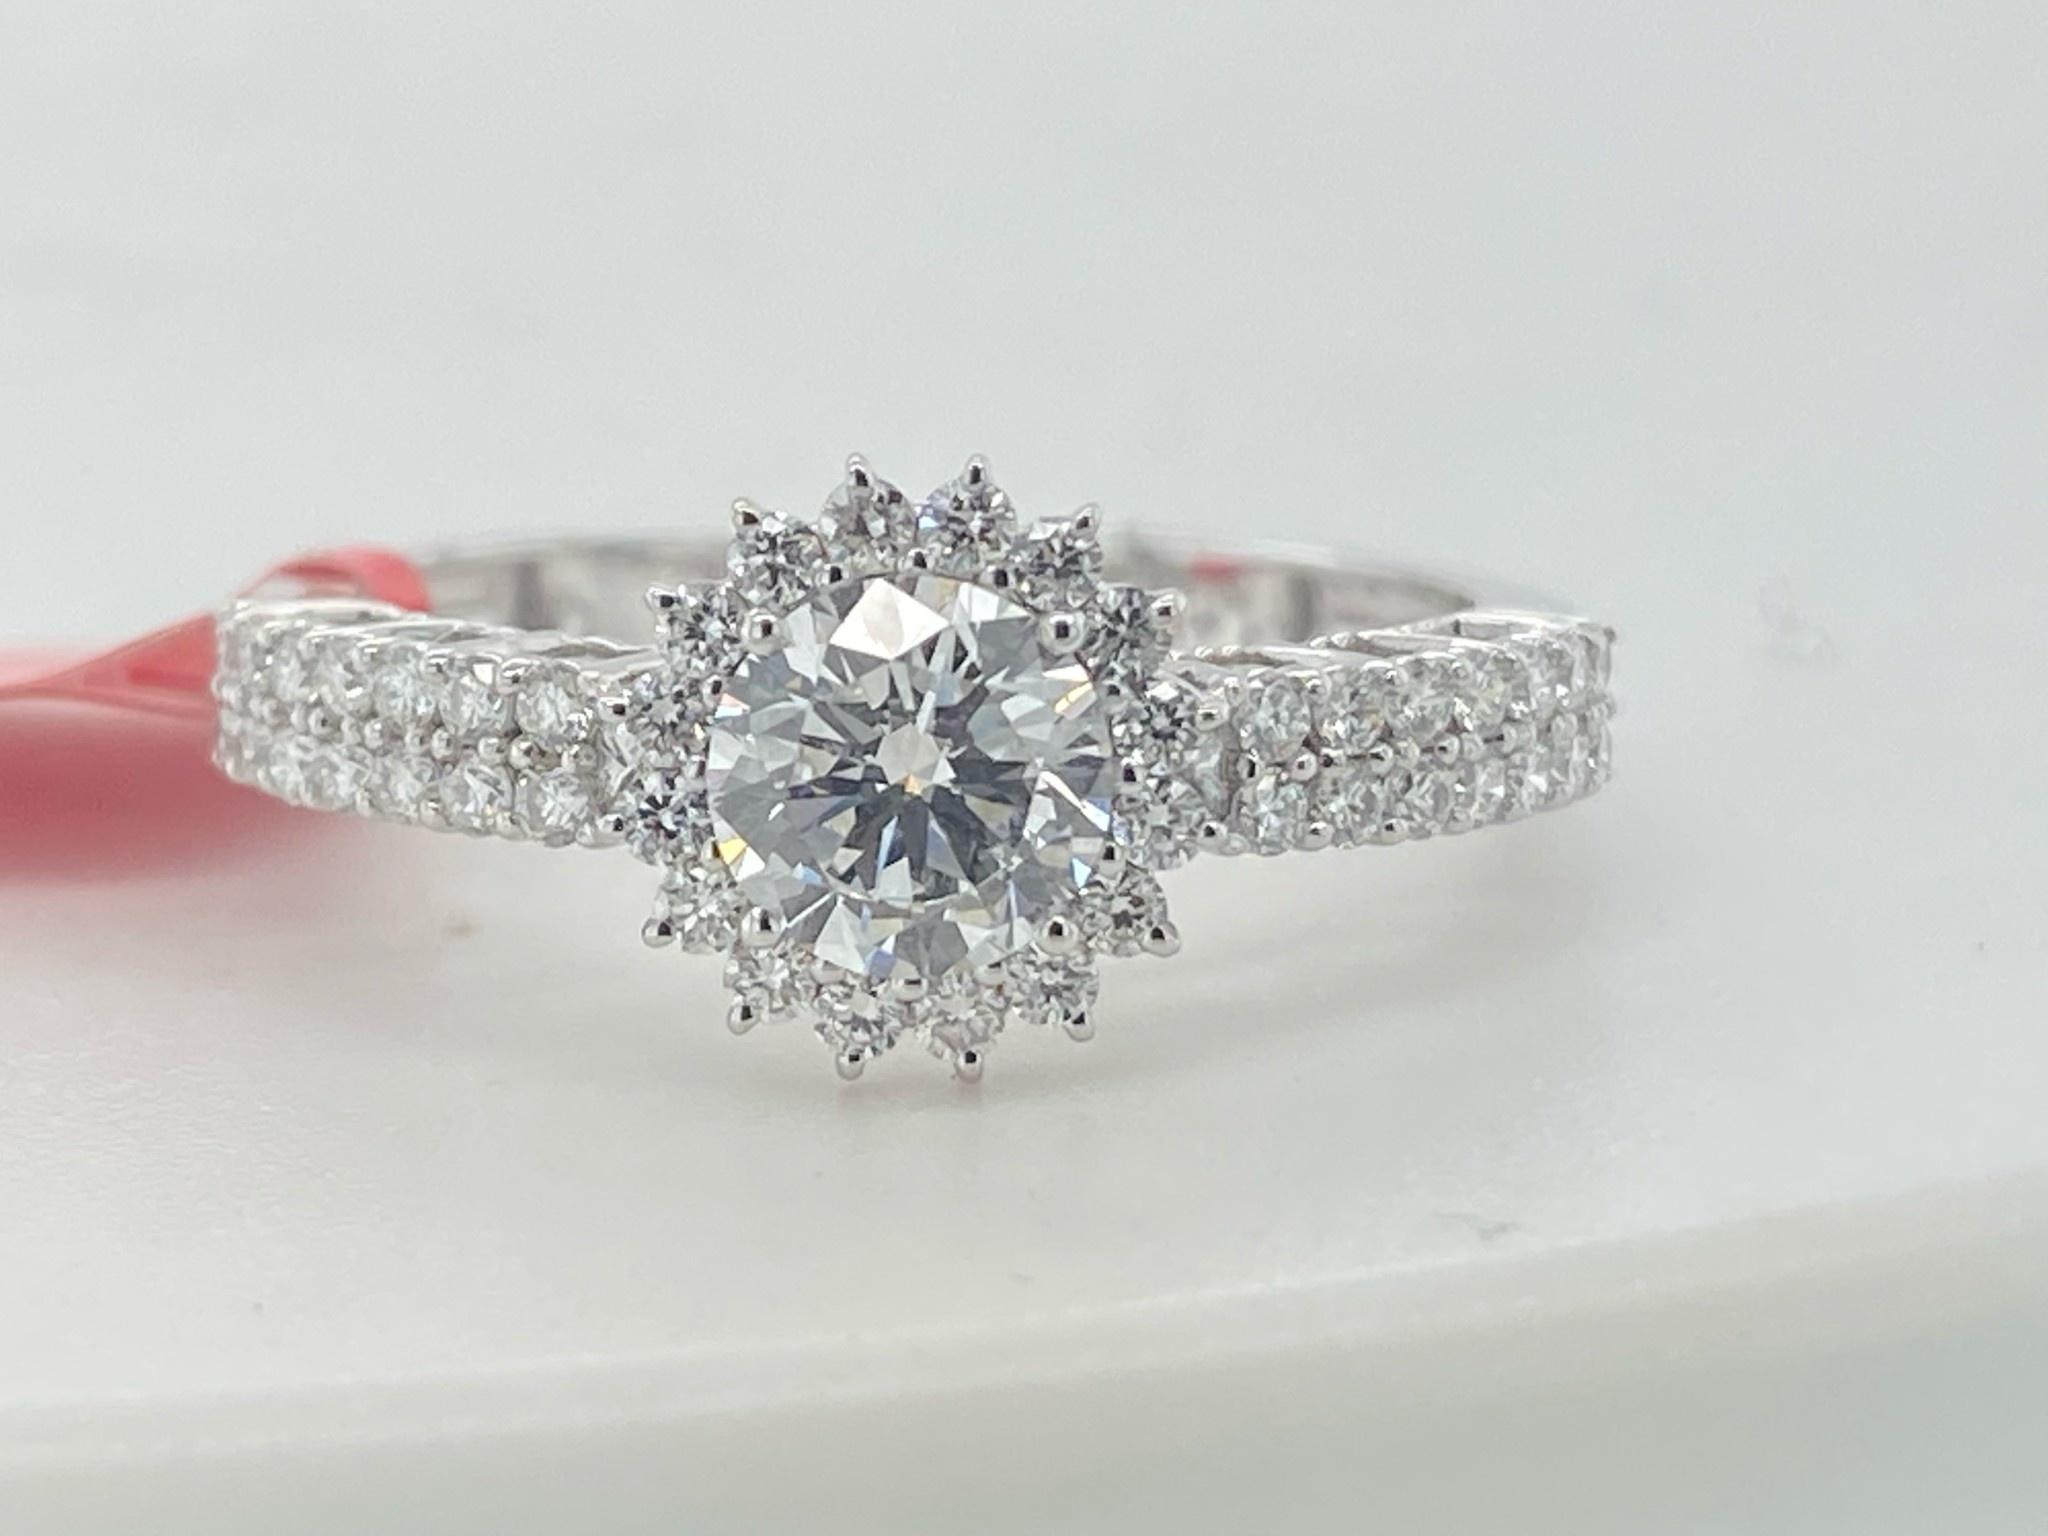 14KW 1.07TW LG Engagement Ring